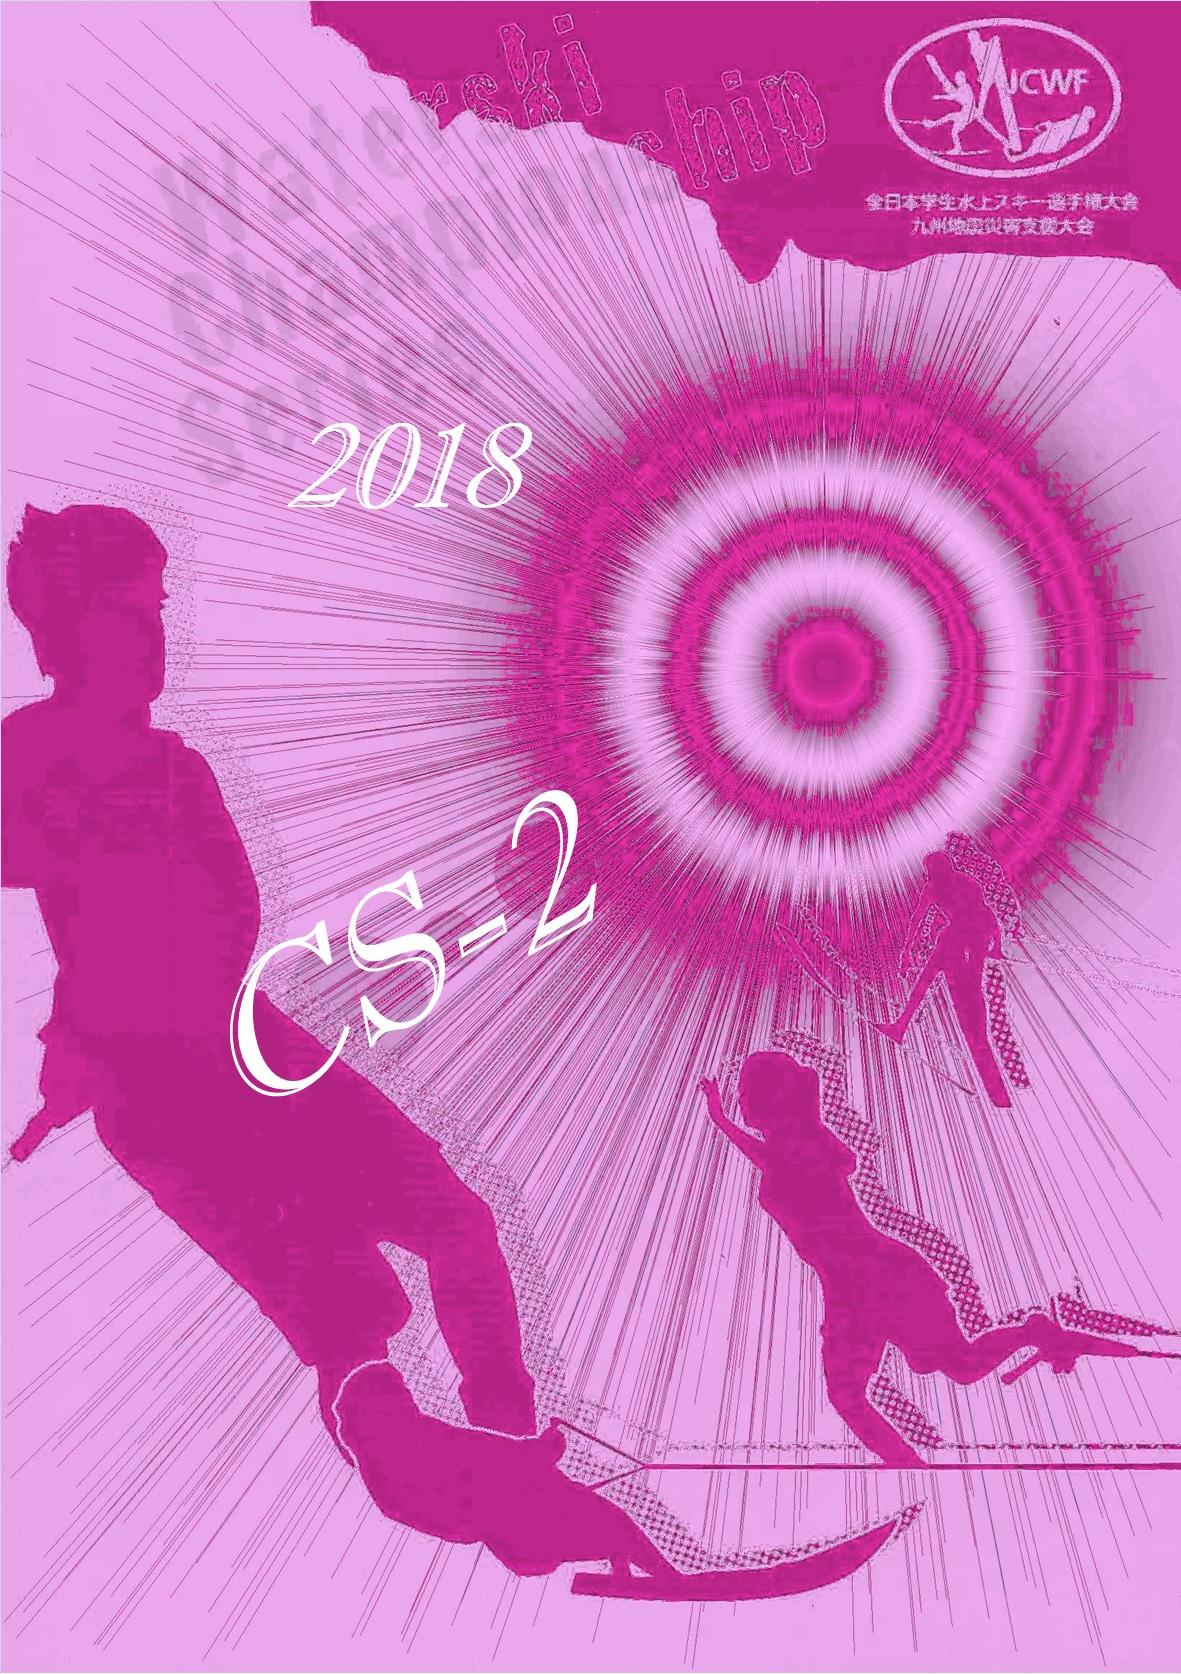 2018CS2 W's